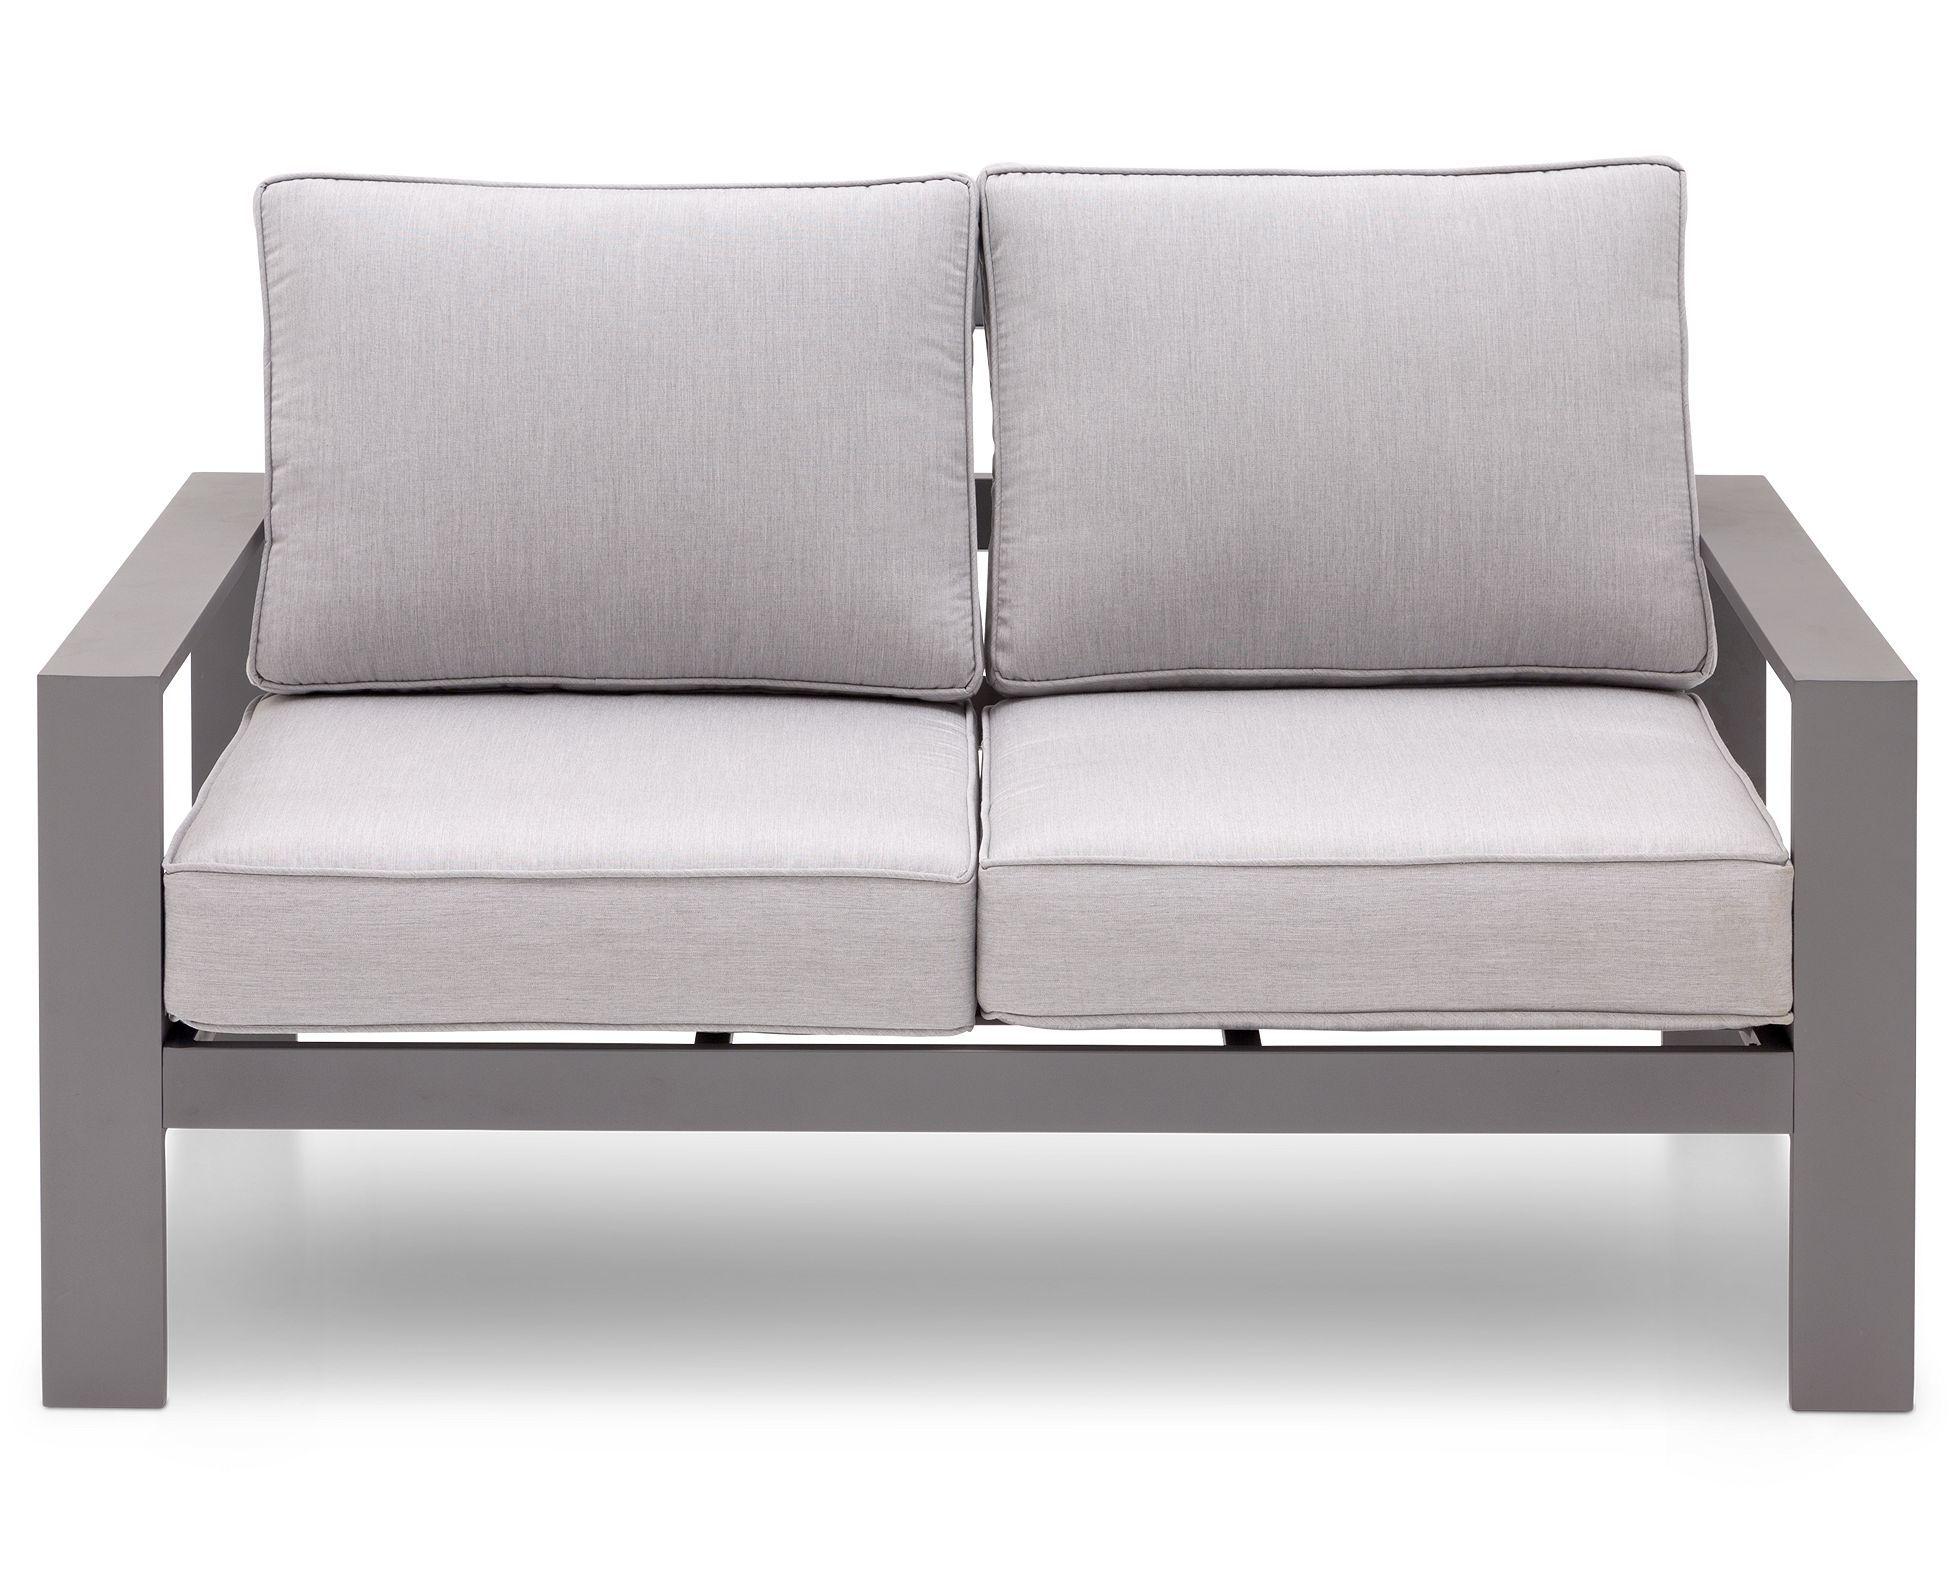 Lugano Patio Loveseat With Cushion